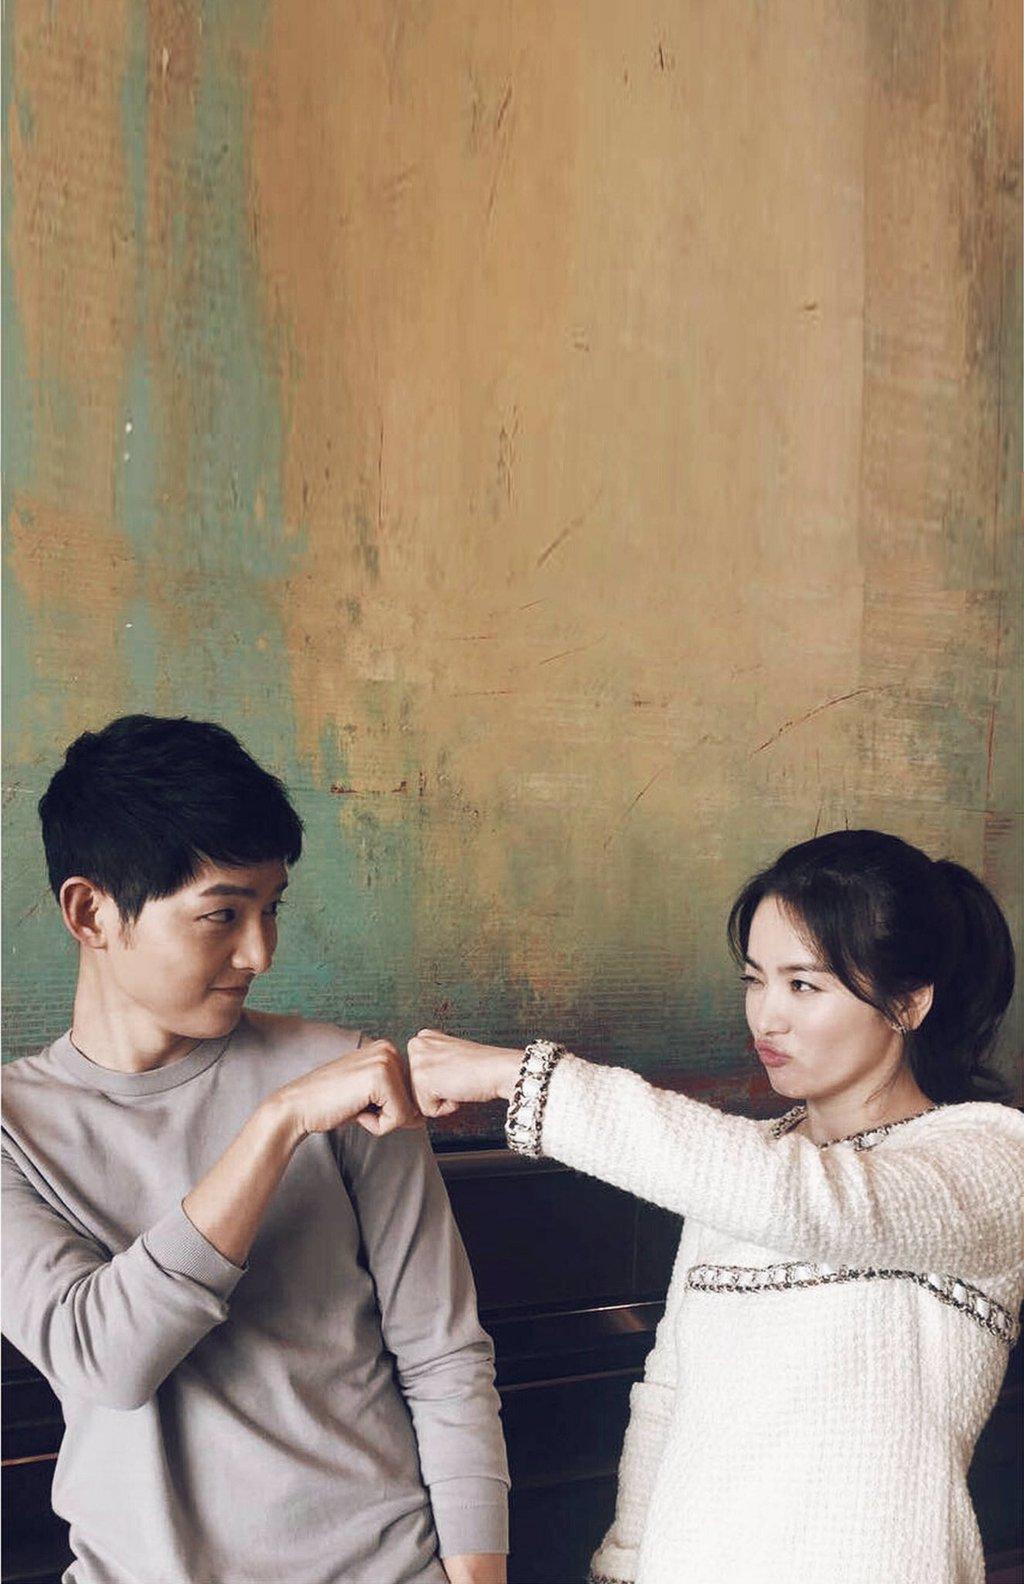 Wallpaper Smartphone Song Joong Ki Dan Song Hye Kyo JauhariNET